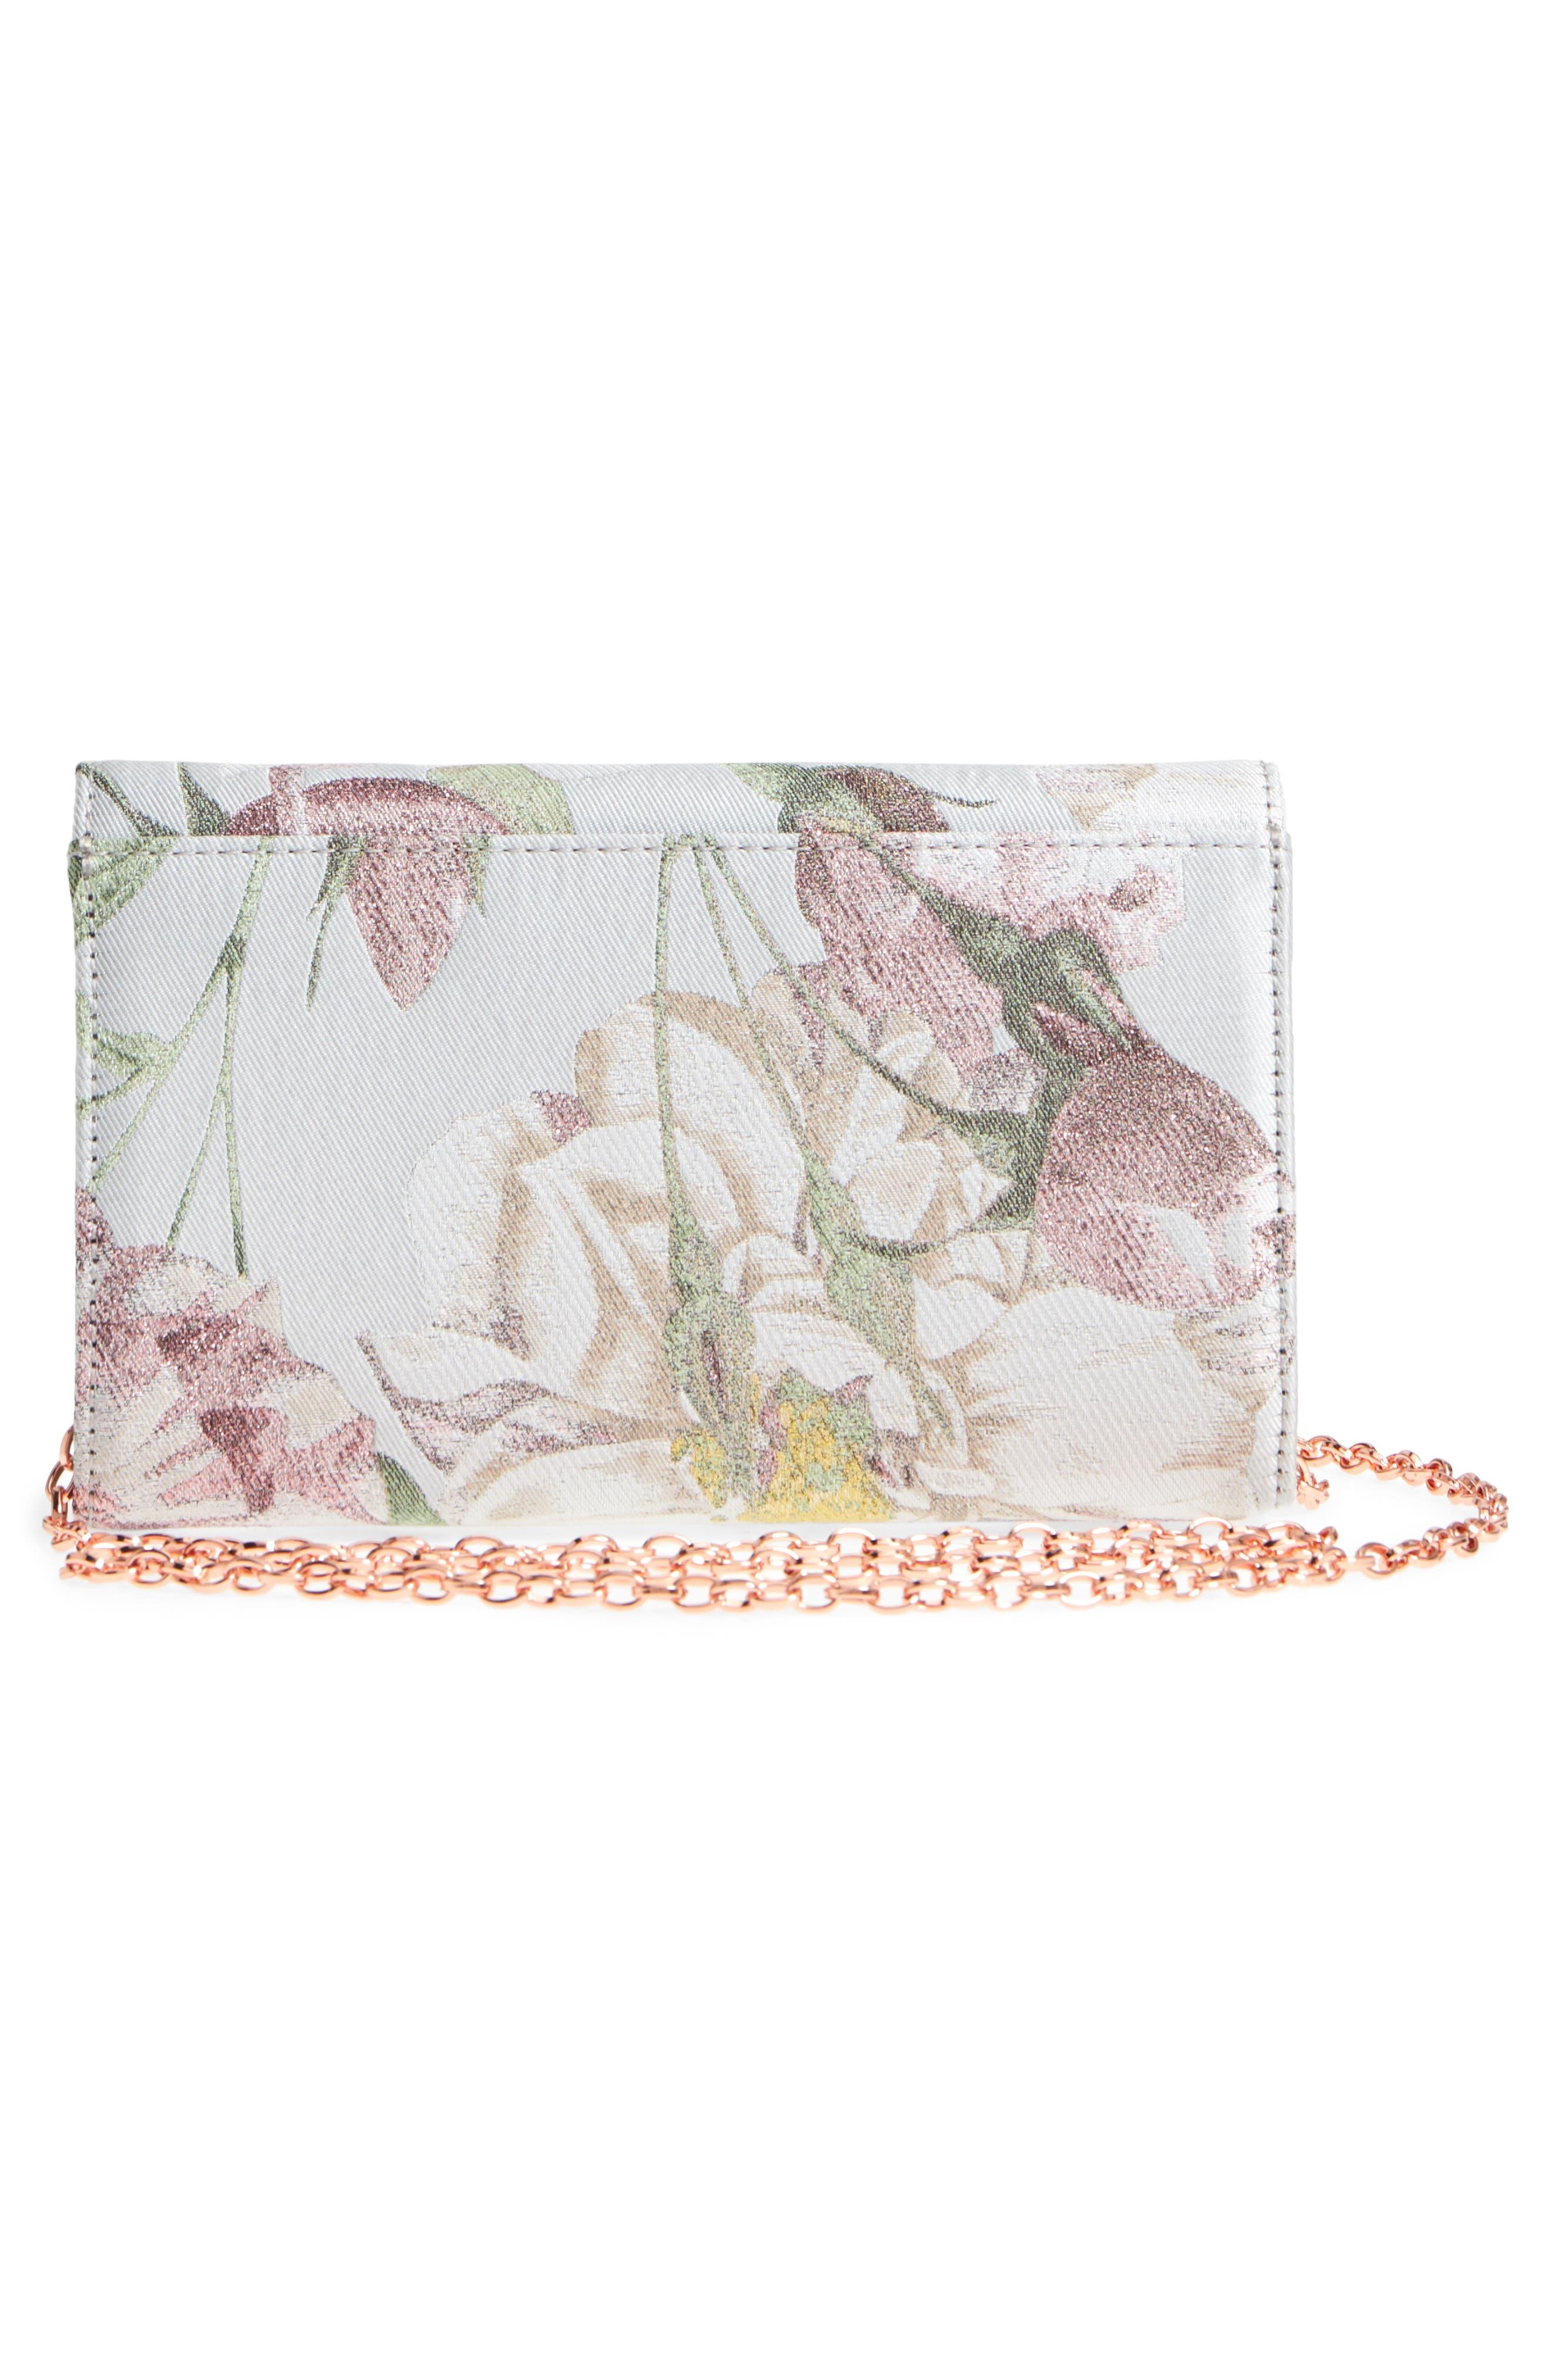 Erika - Metallic Jacquard Evening Bag,                             Alternate thumbnail 3, color,                             030